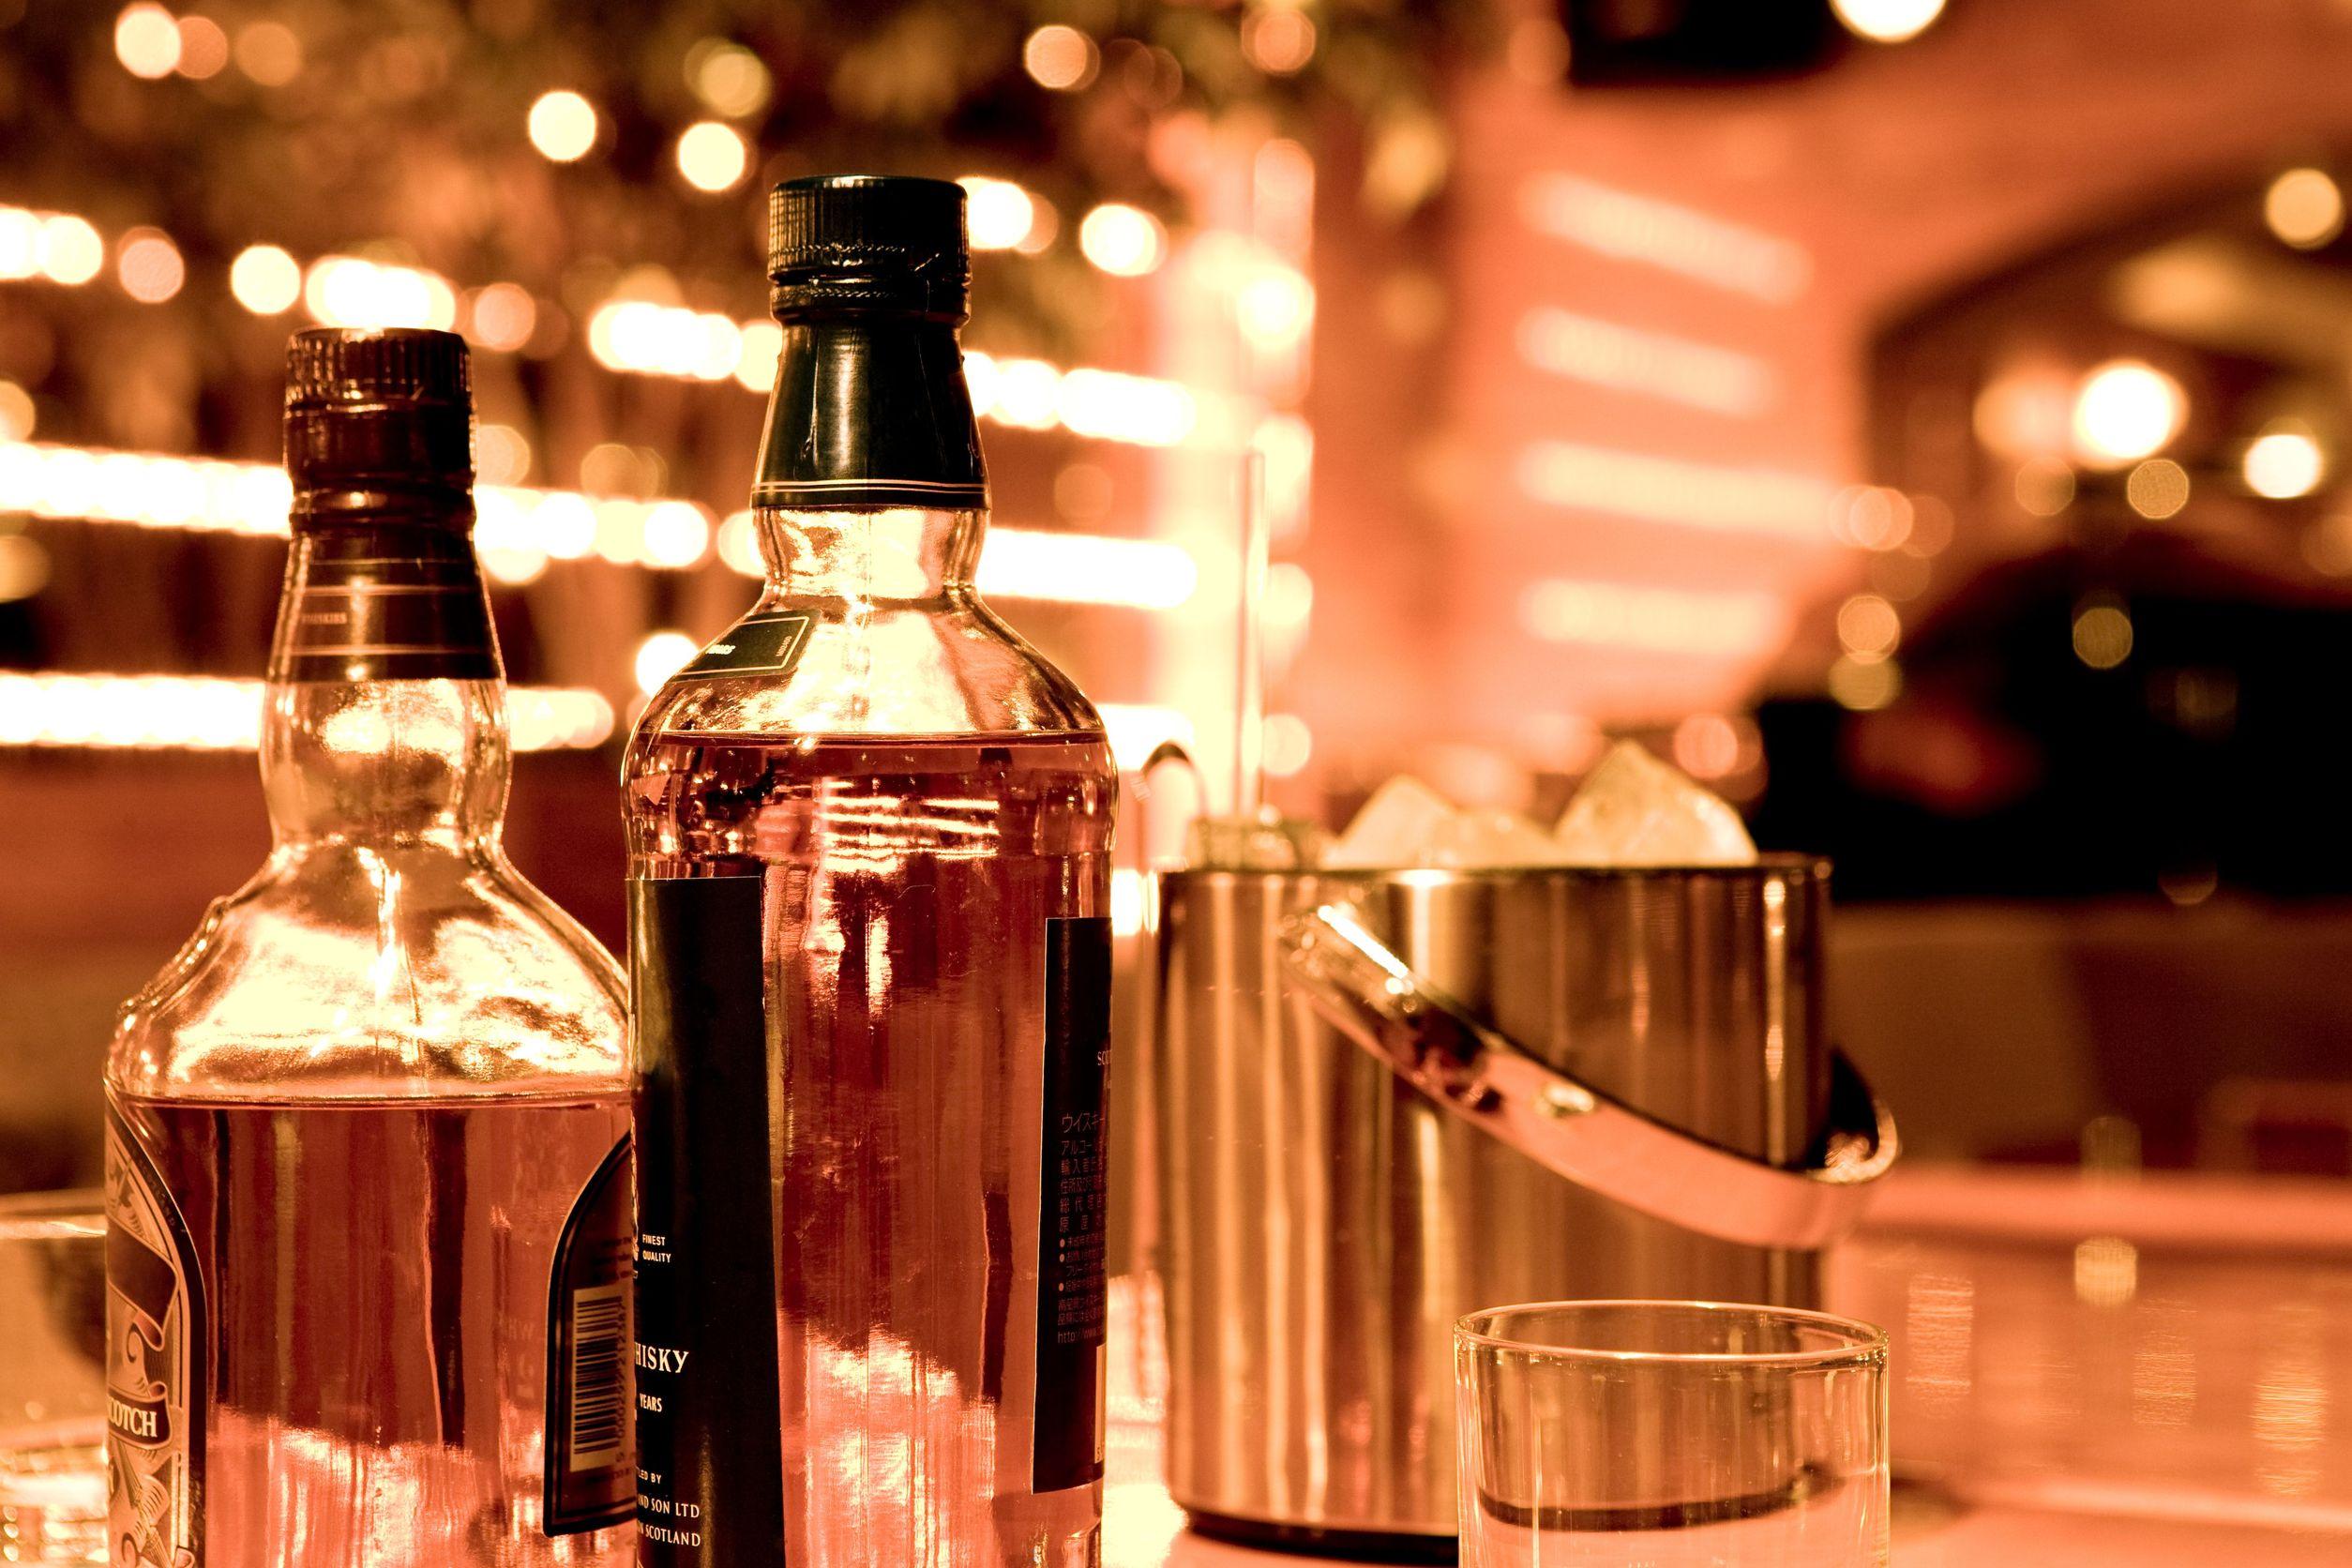 whisky price in pune